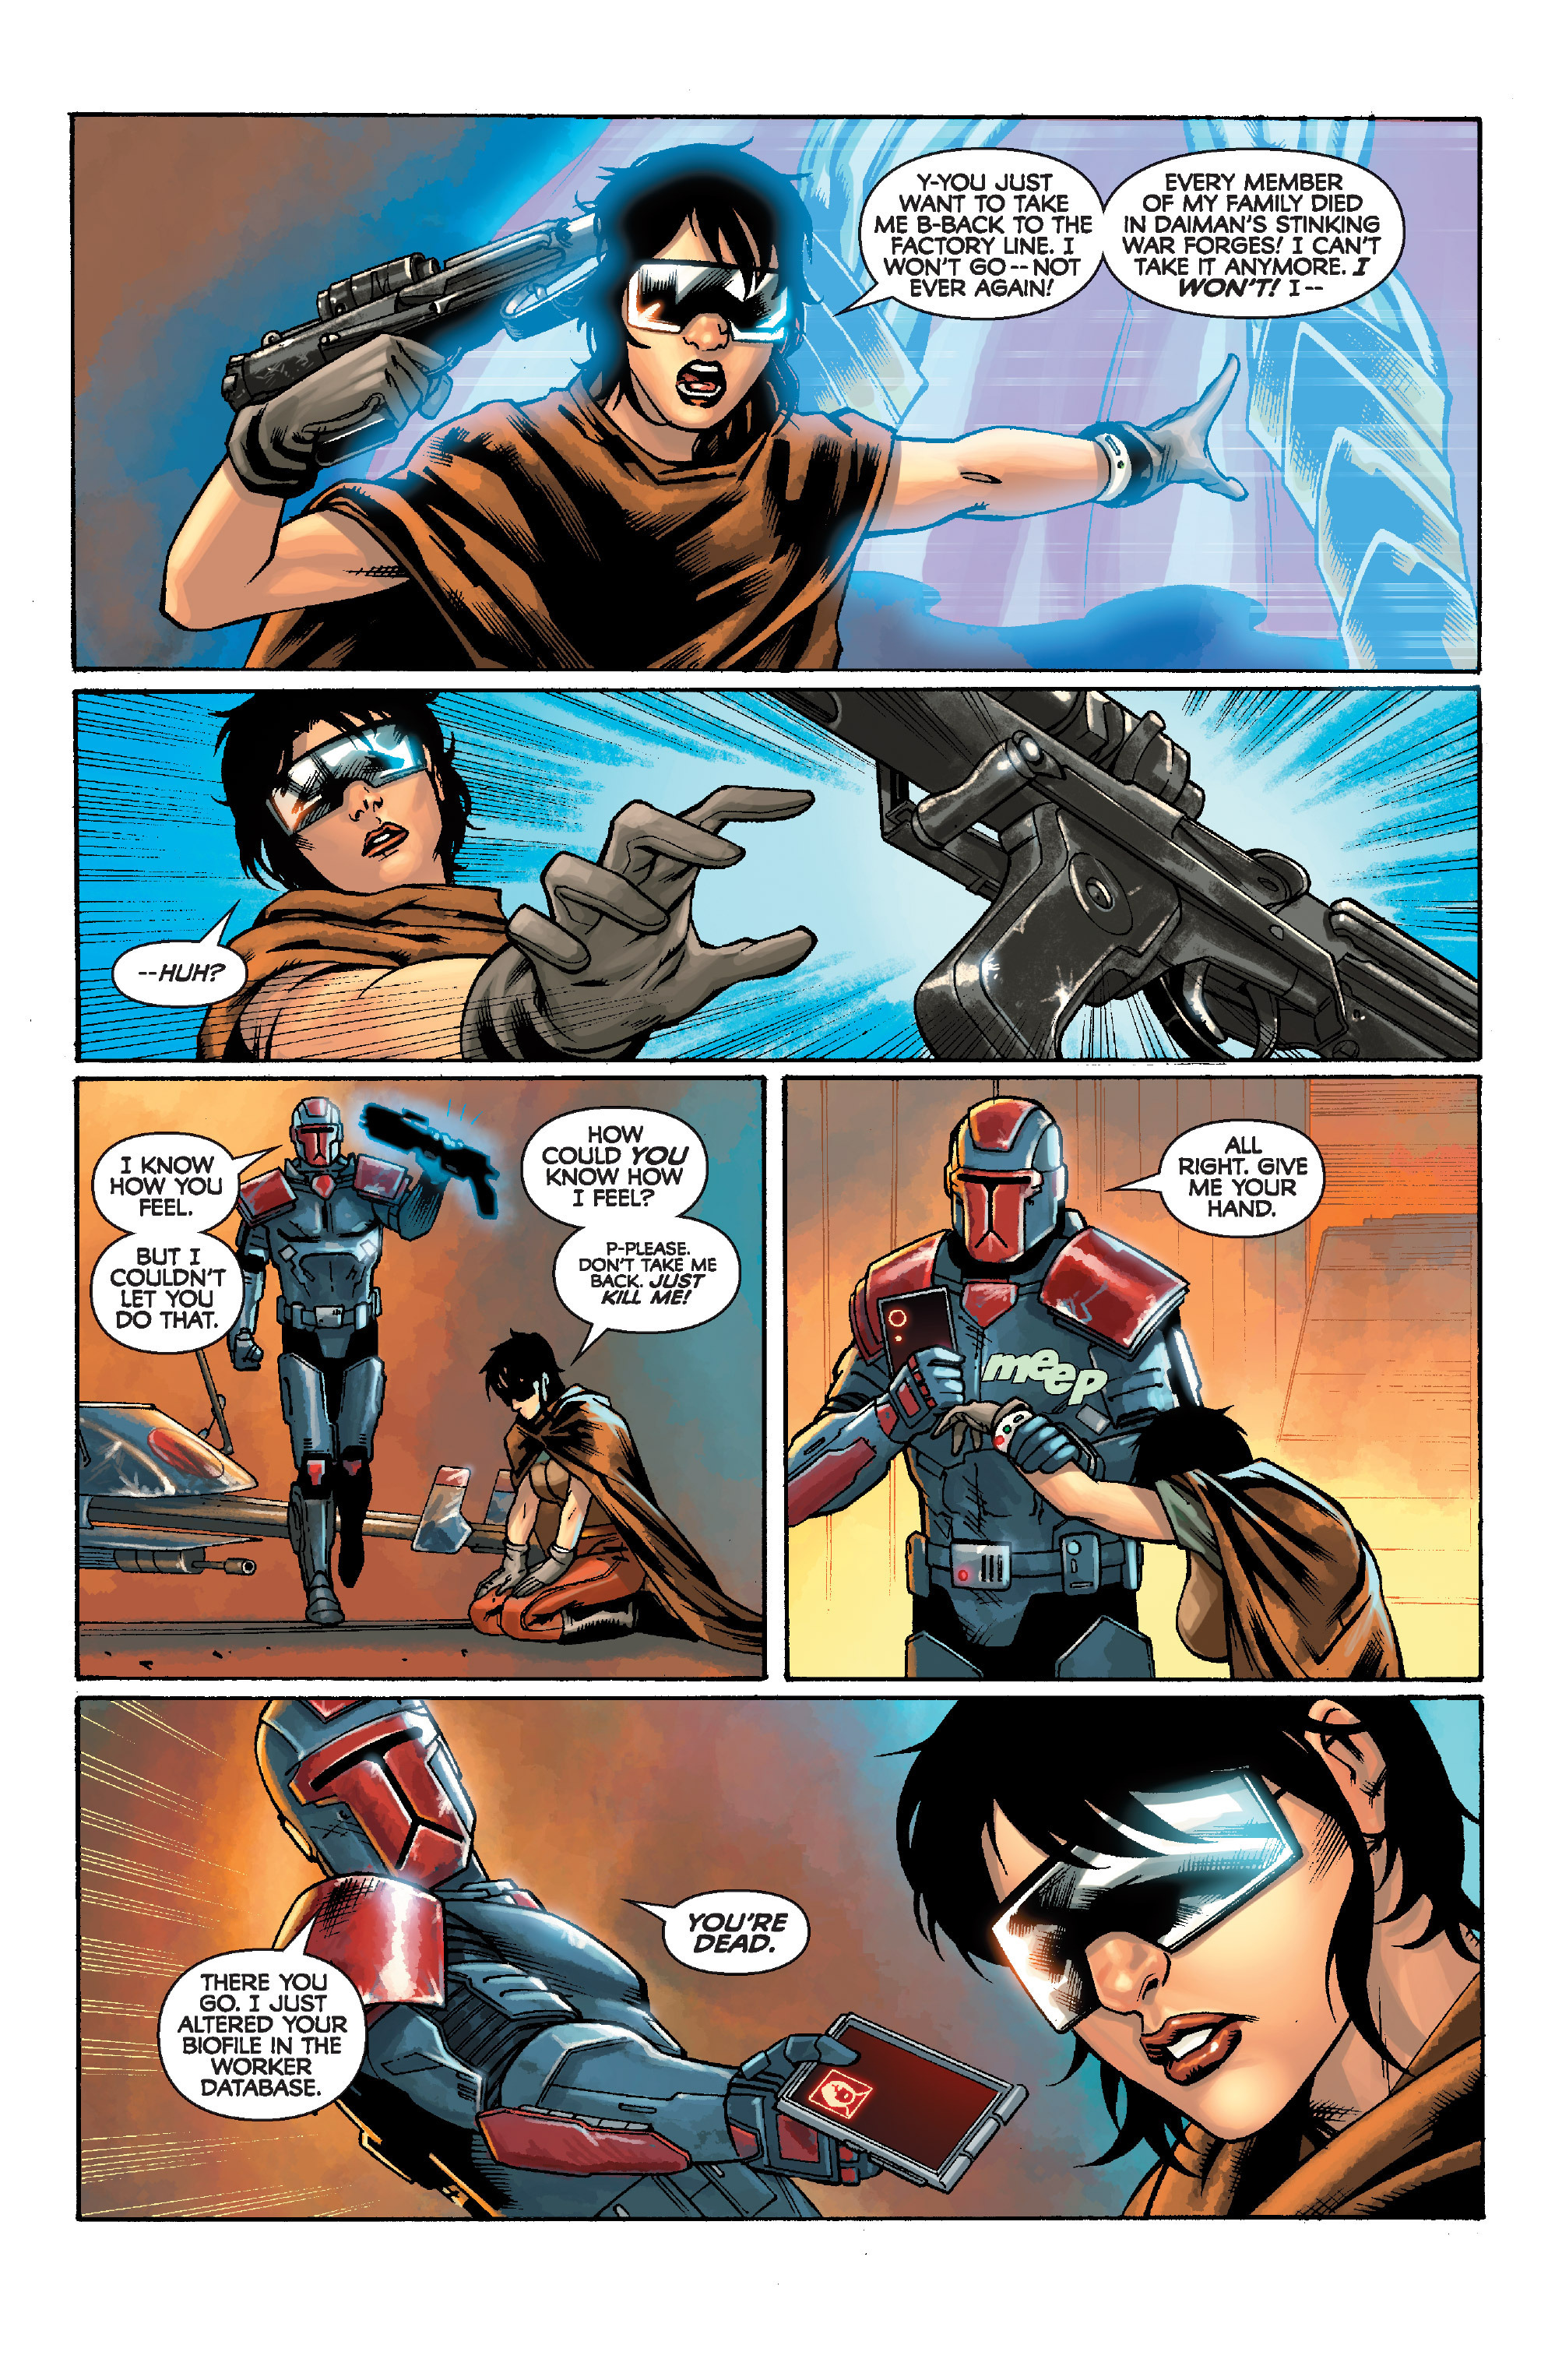 Read online Star Wars: Knight Errant - Escape comic -  Issue #1 - 6